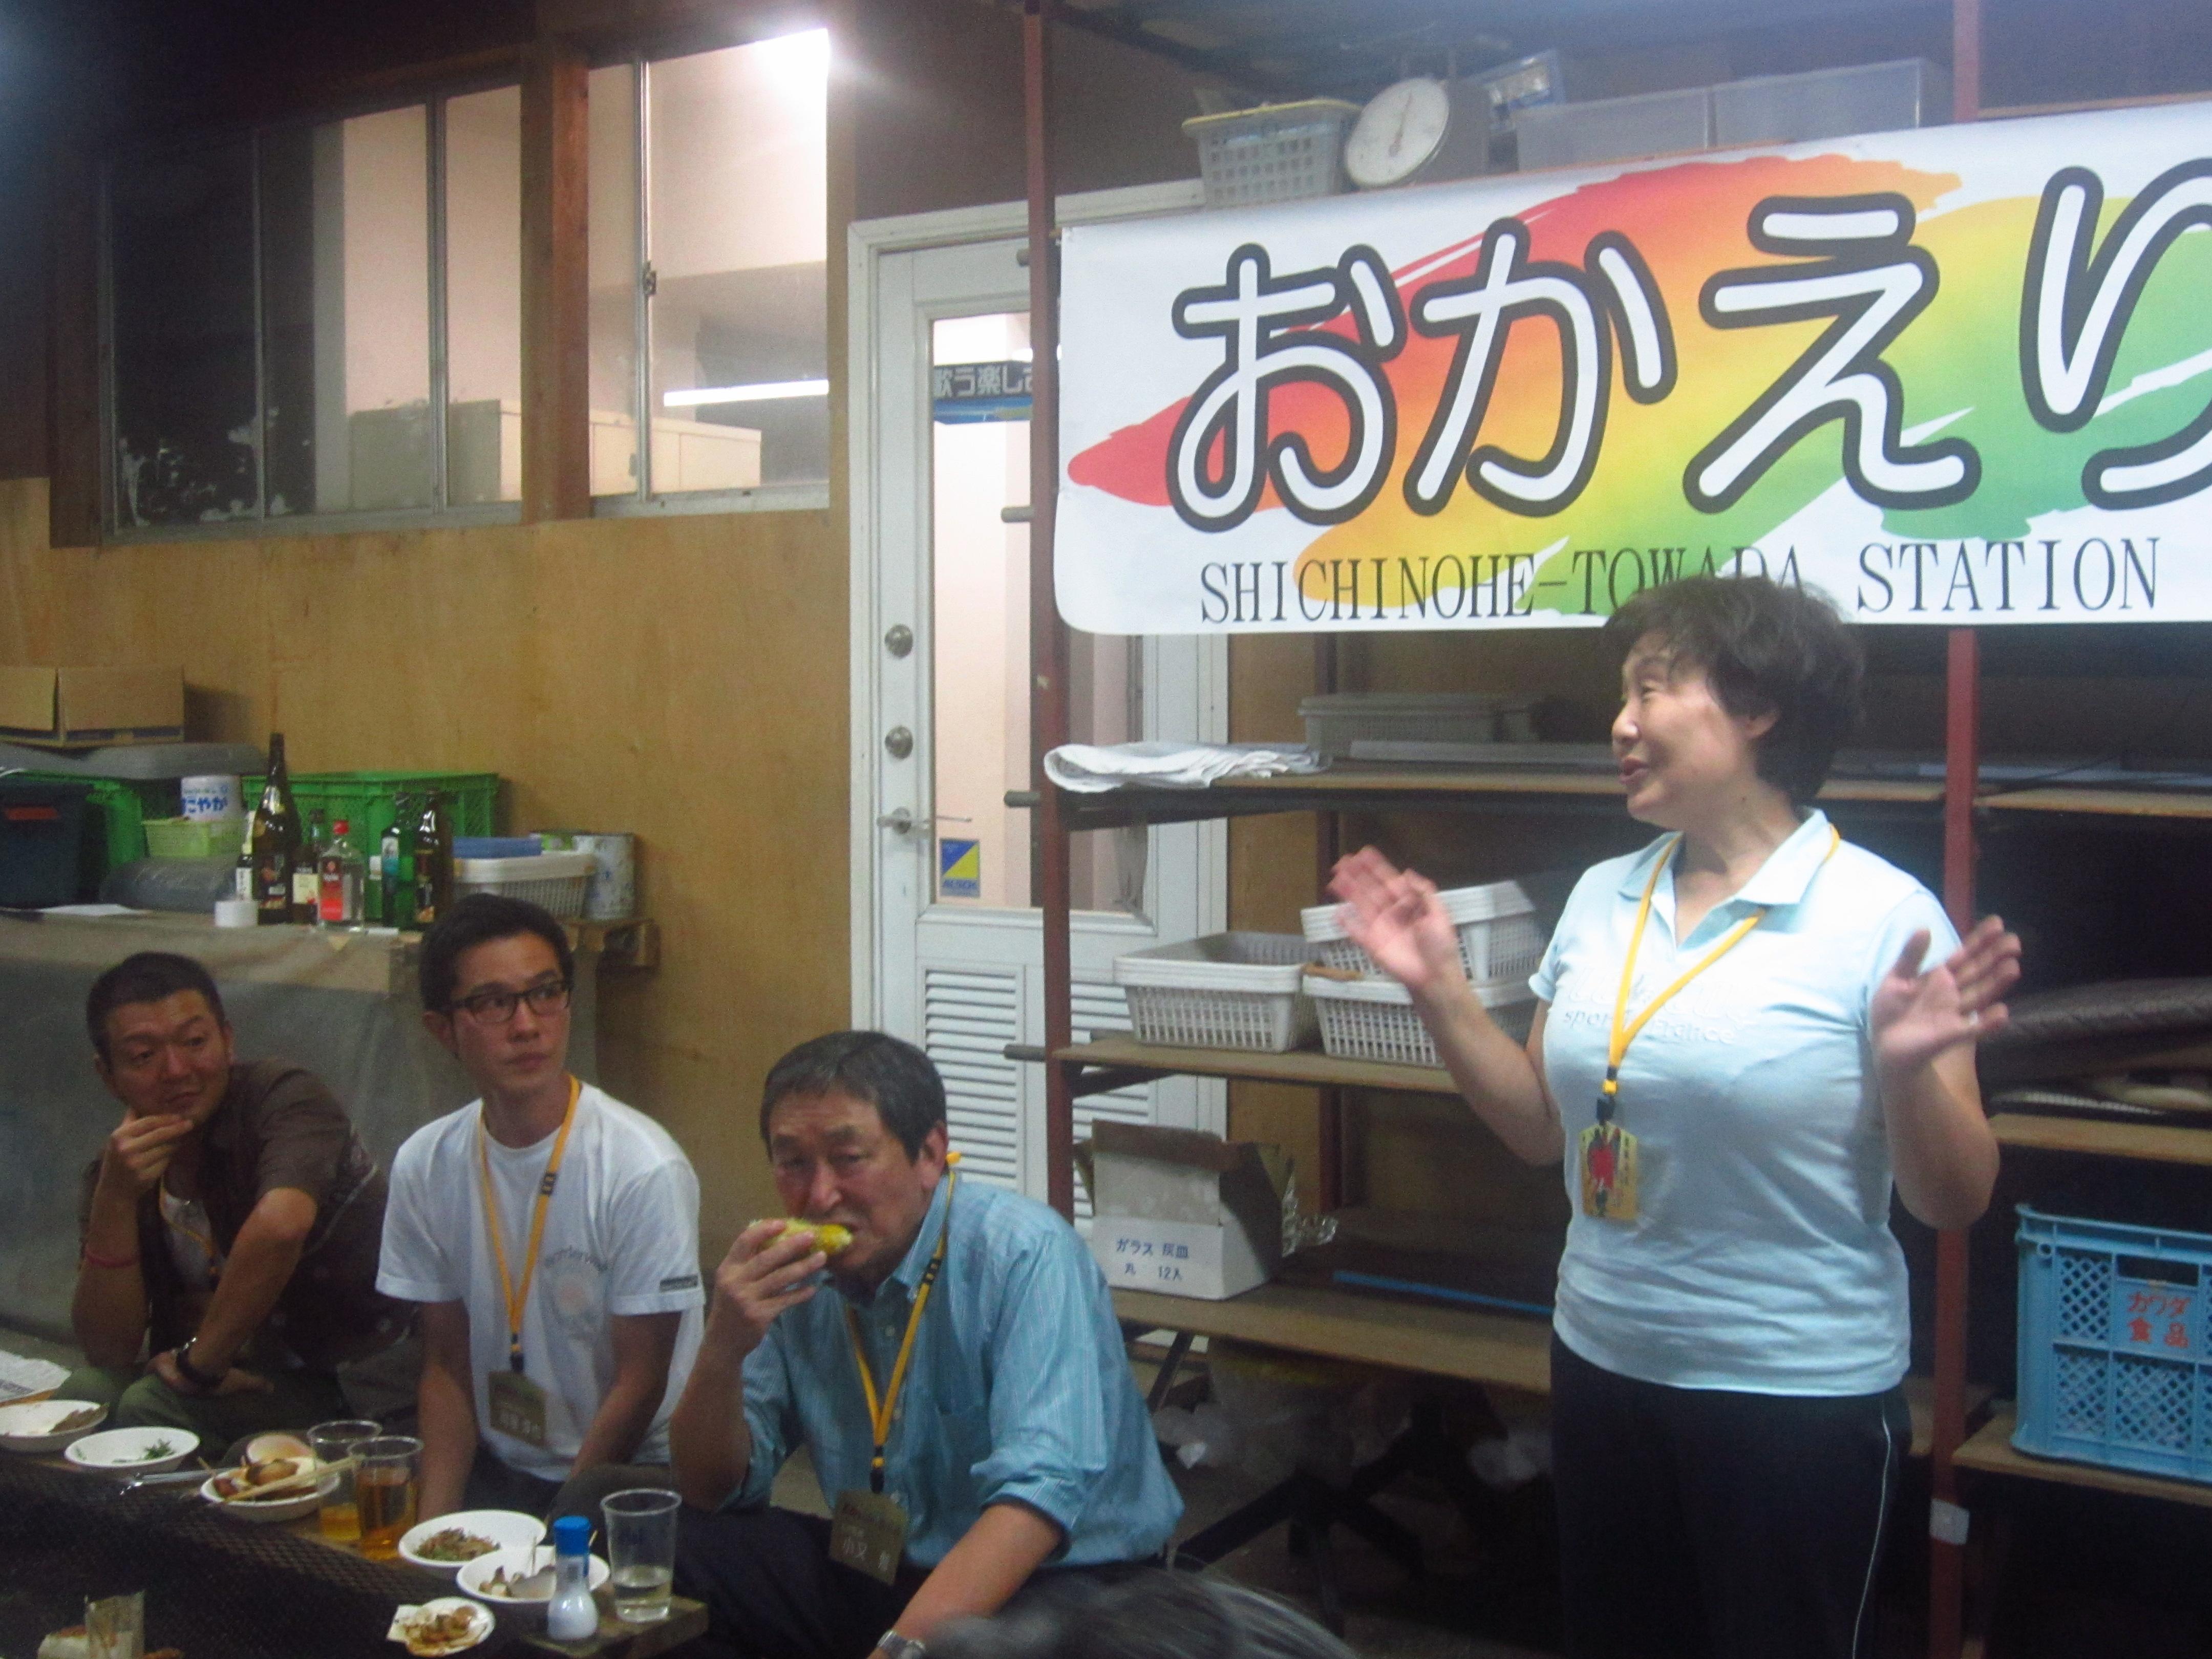 IMG 4411 - 麻布十番納涼祭り25,26日(七戸町出店)